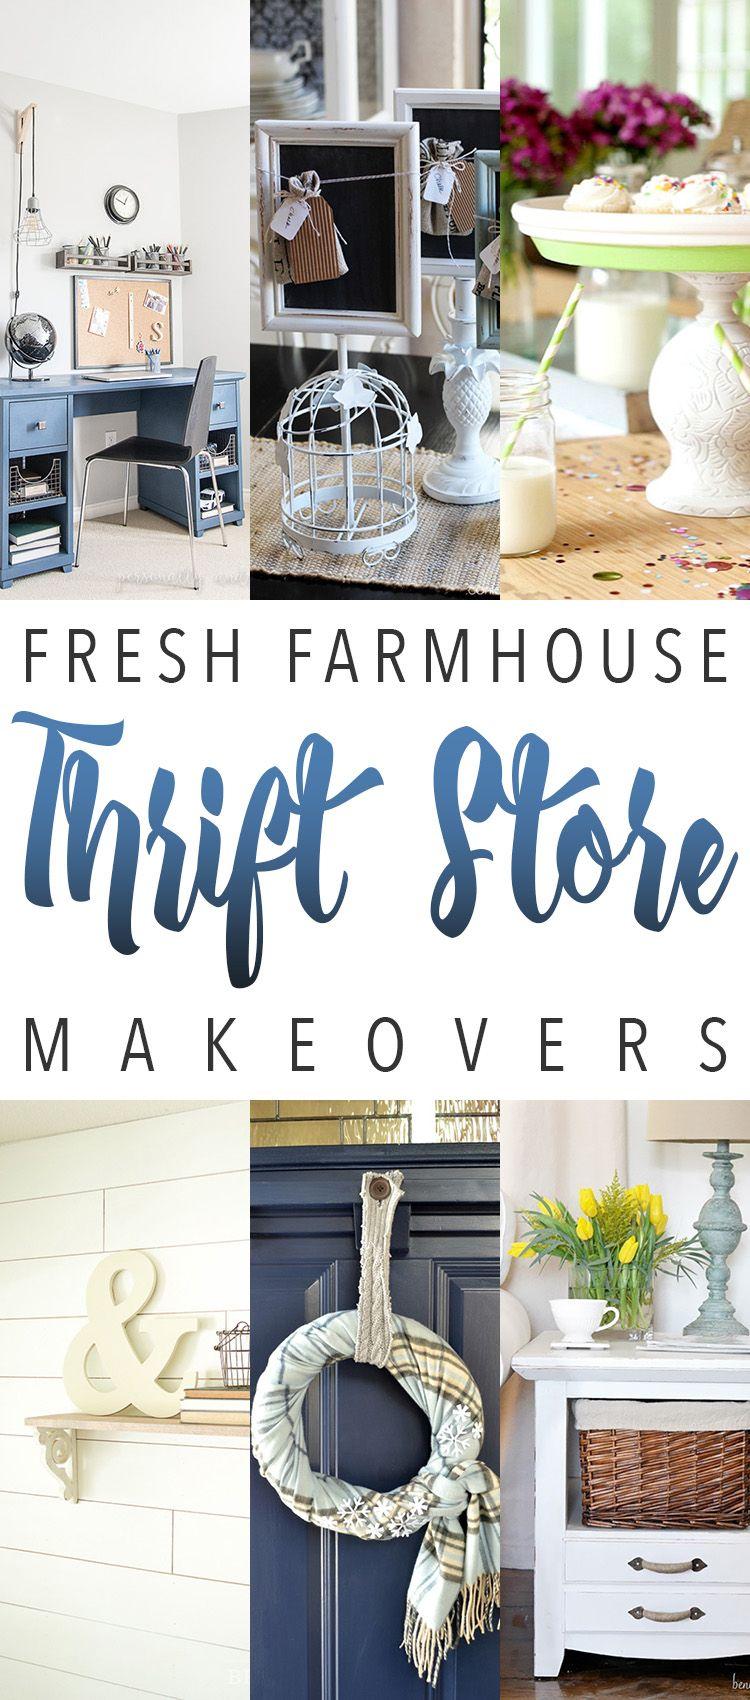 Farmhouse Decor Clean Crisp Organized Farmhouse: Fresh Farmhouse Thrift Store Makeovers